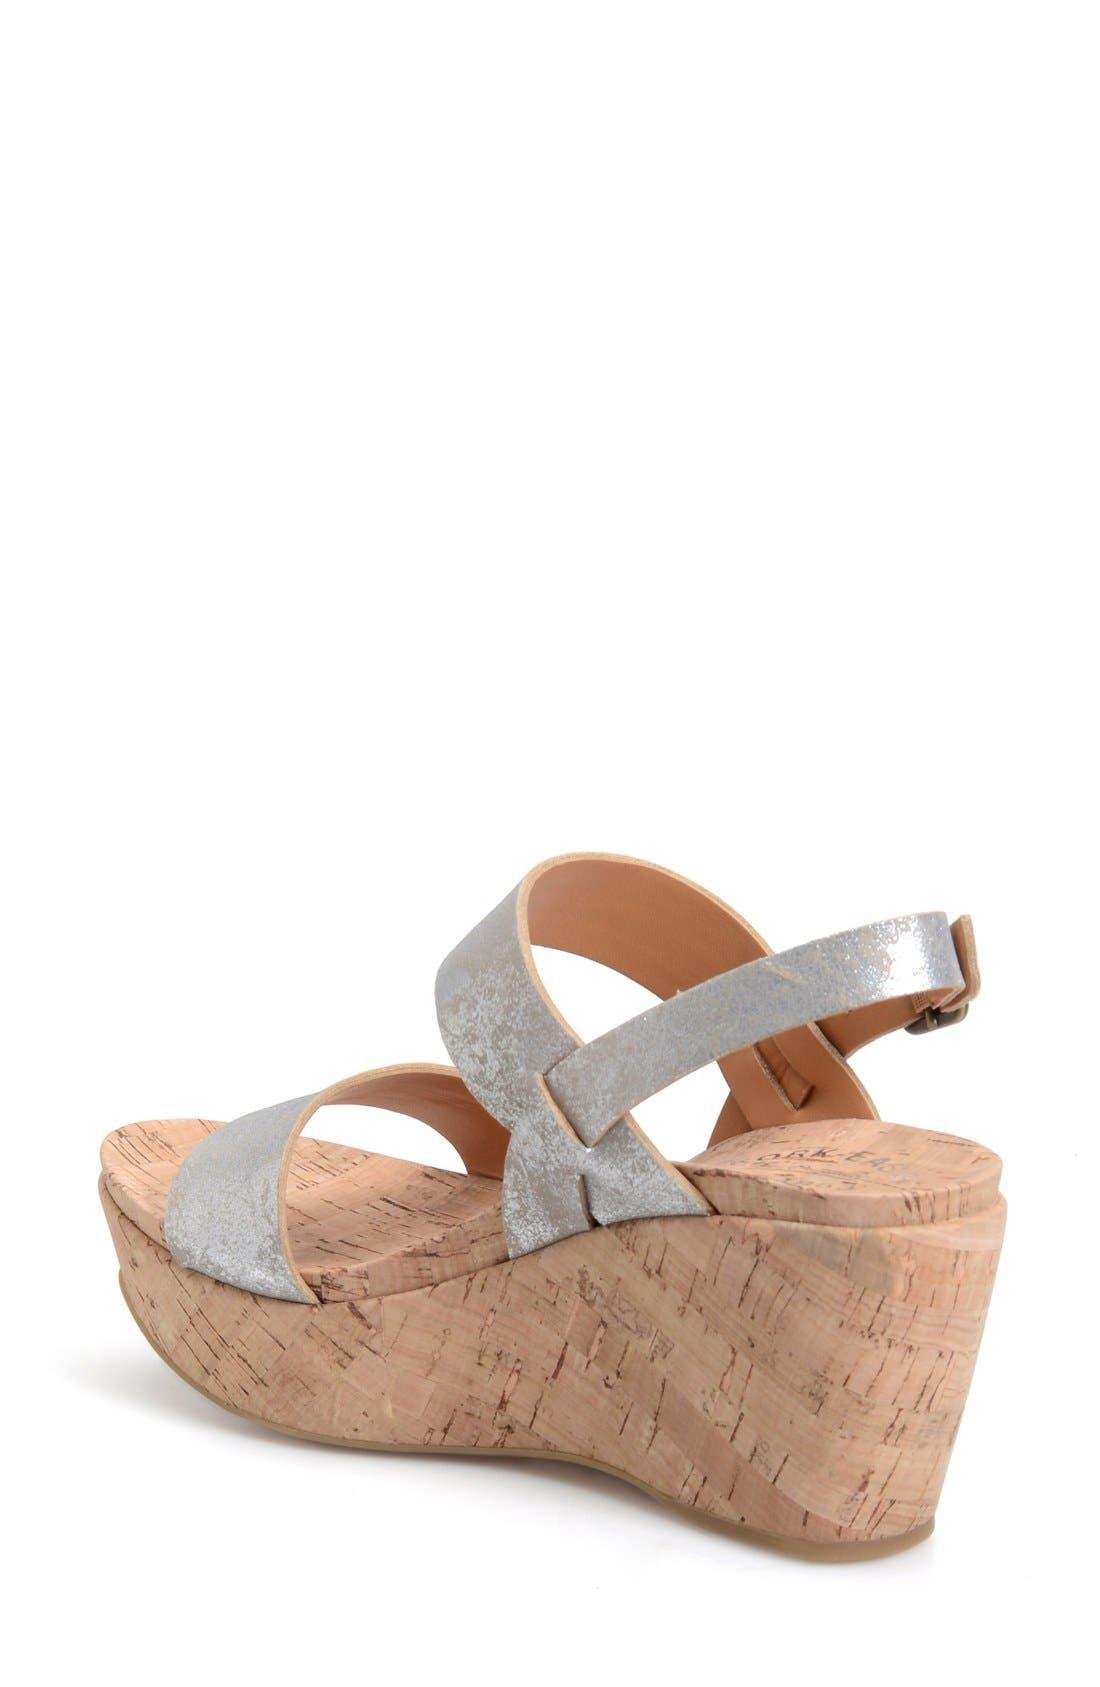 'Austin' Slingback Wedge Sandal,                             Alternate thumbnail 16, color,